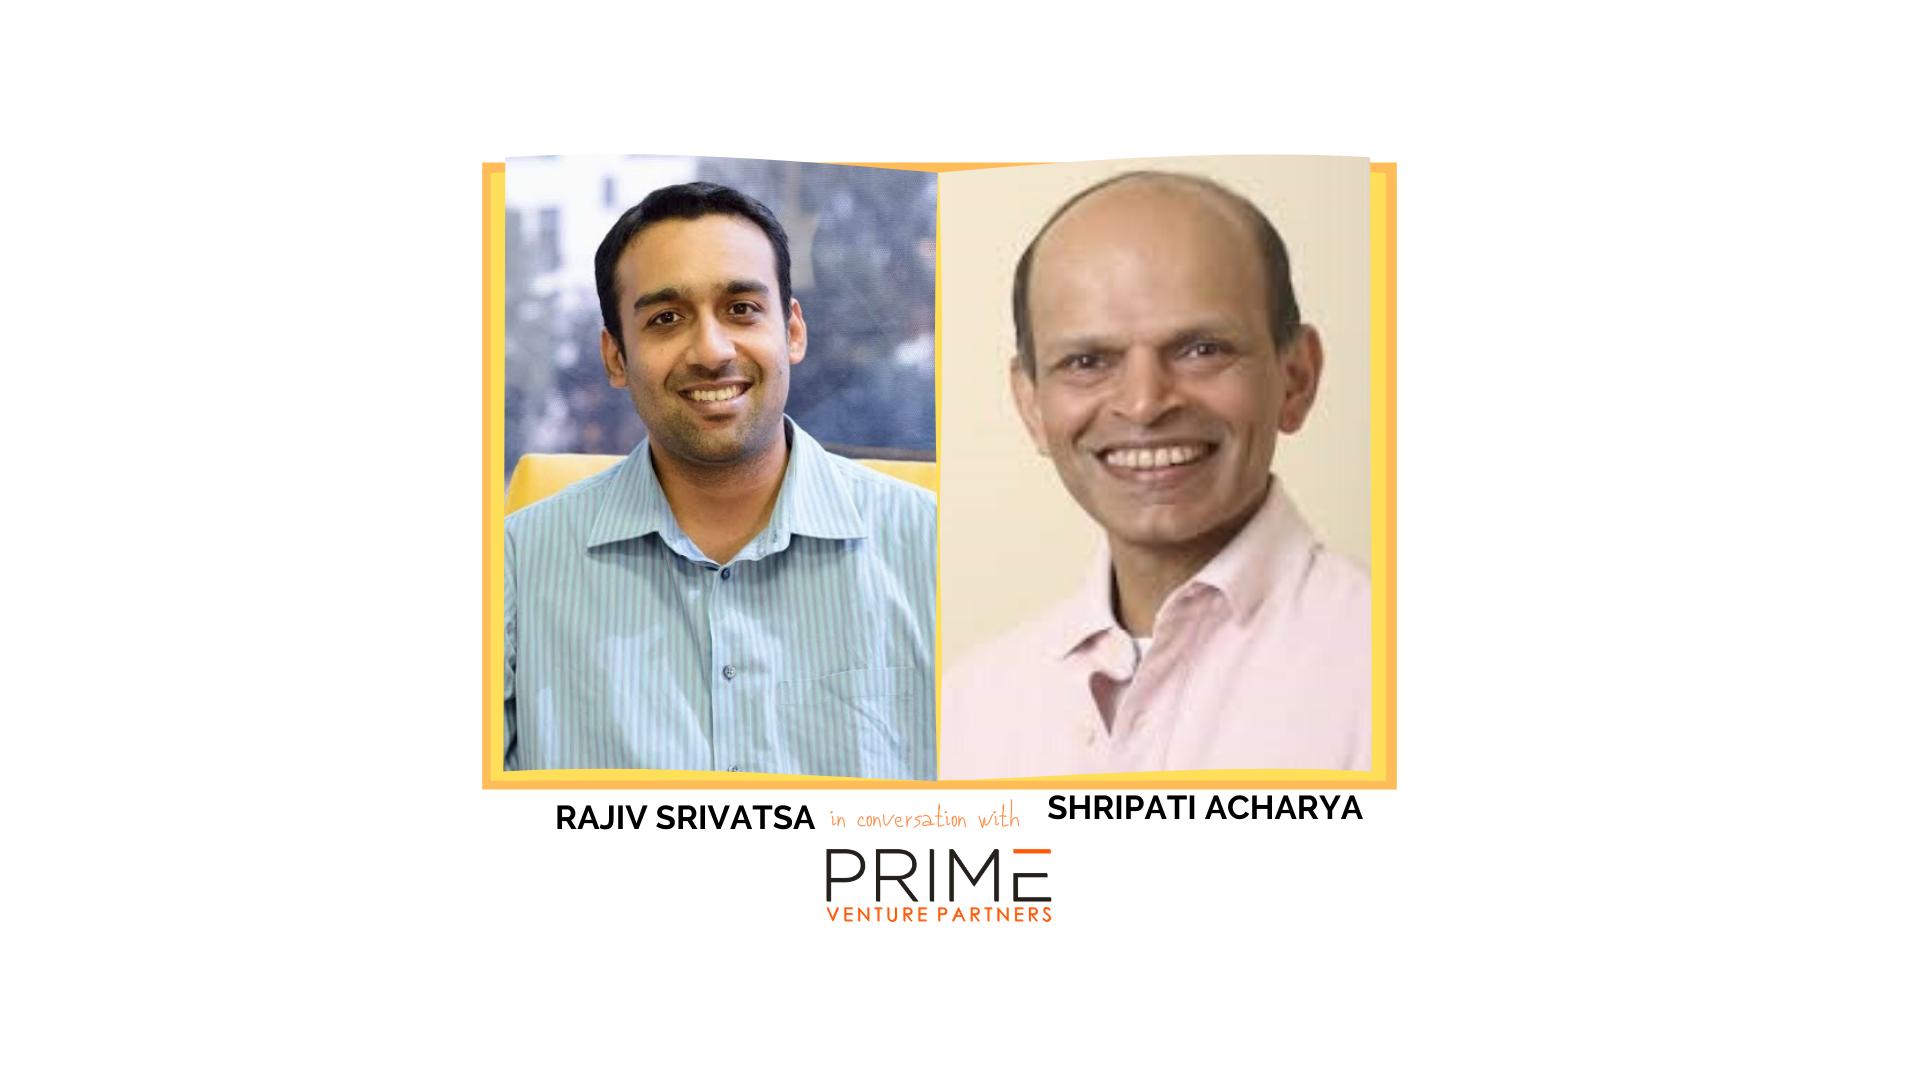 Scale, Profitability and Culture with Rajiv Srivatsa, Co-Founder Urban Ladder